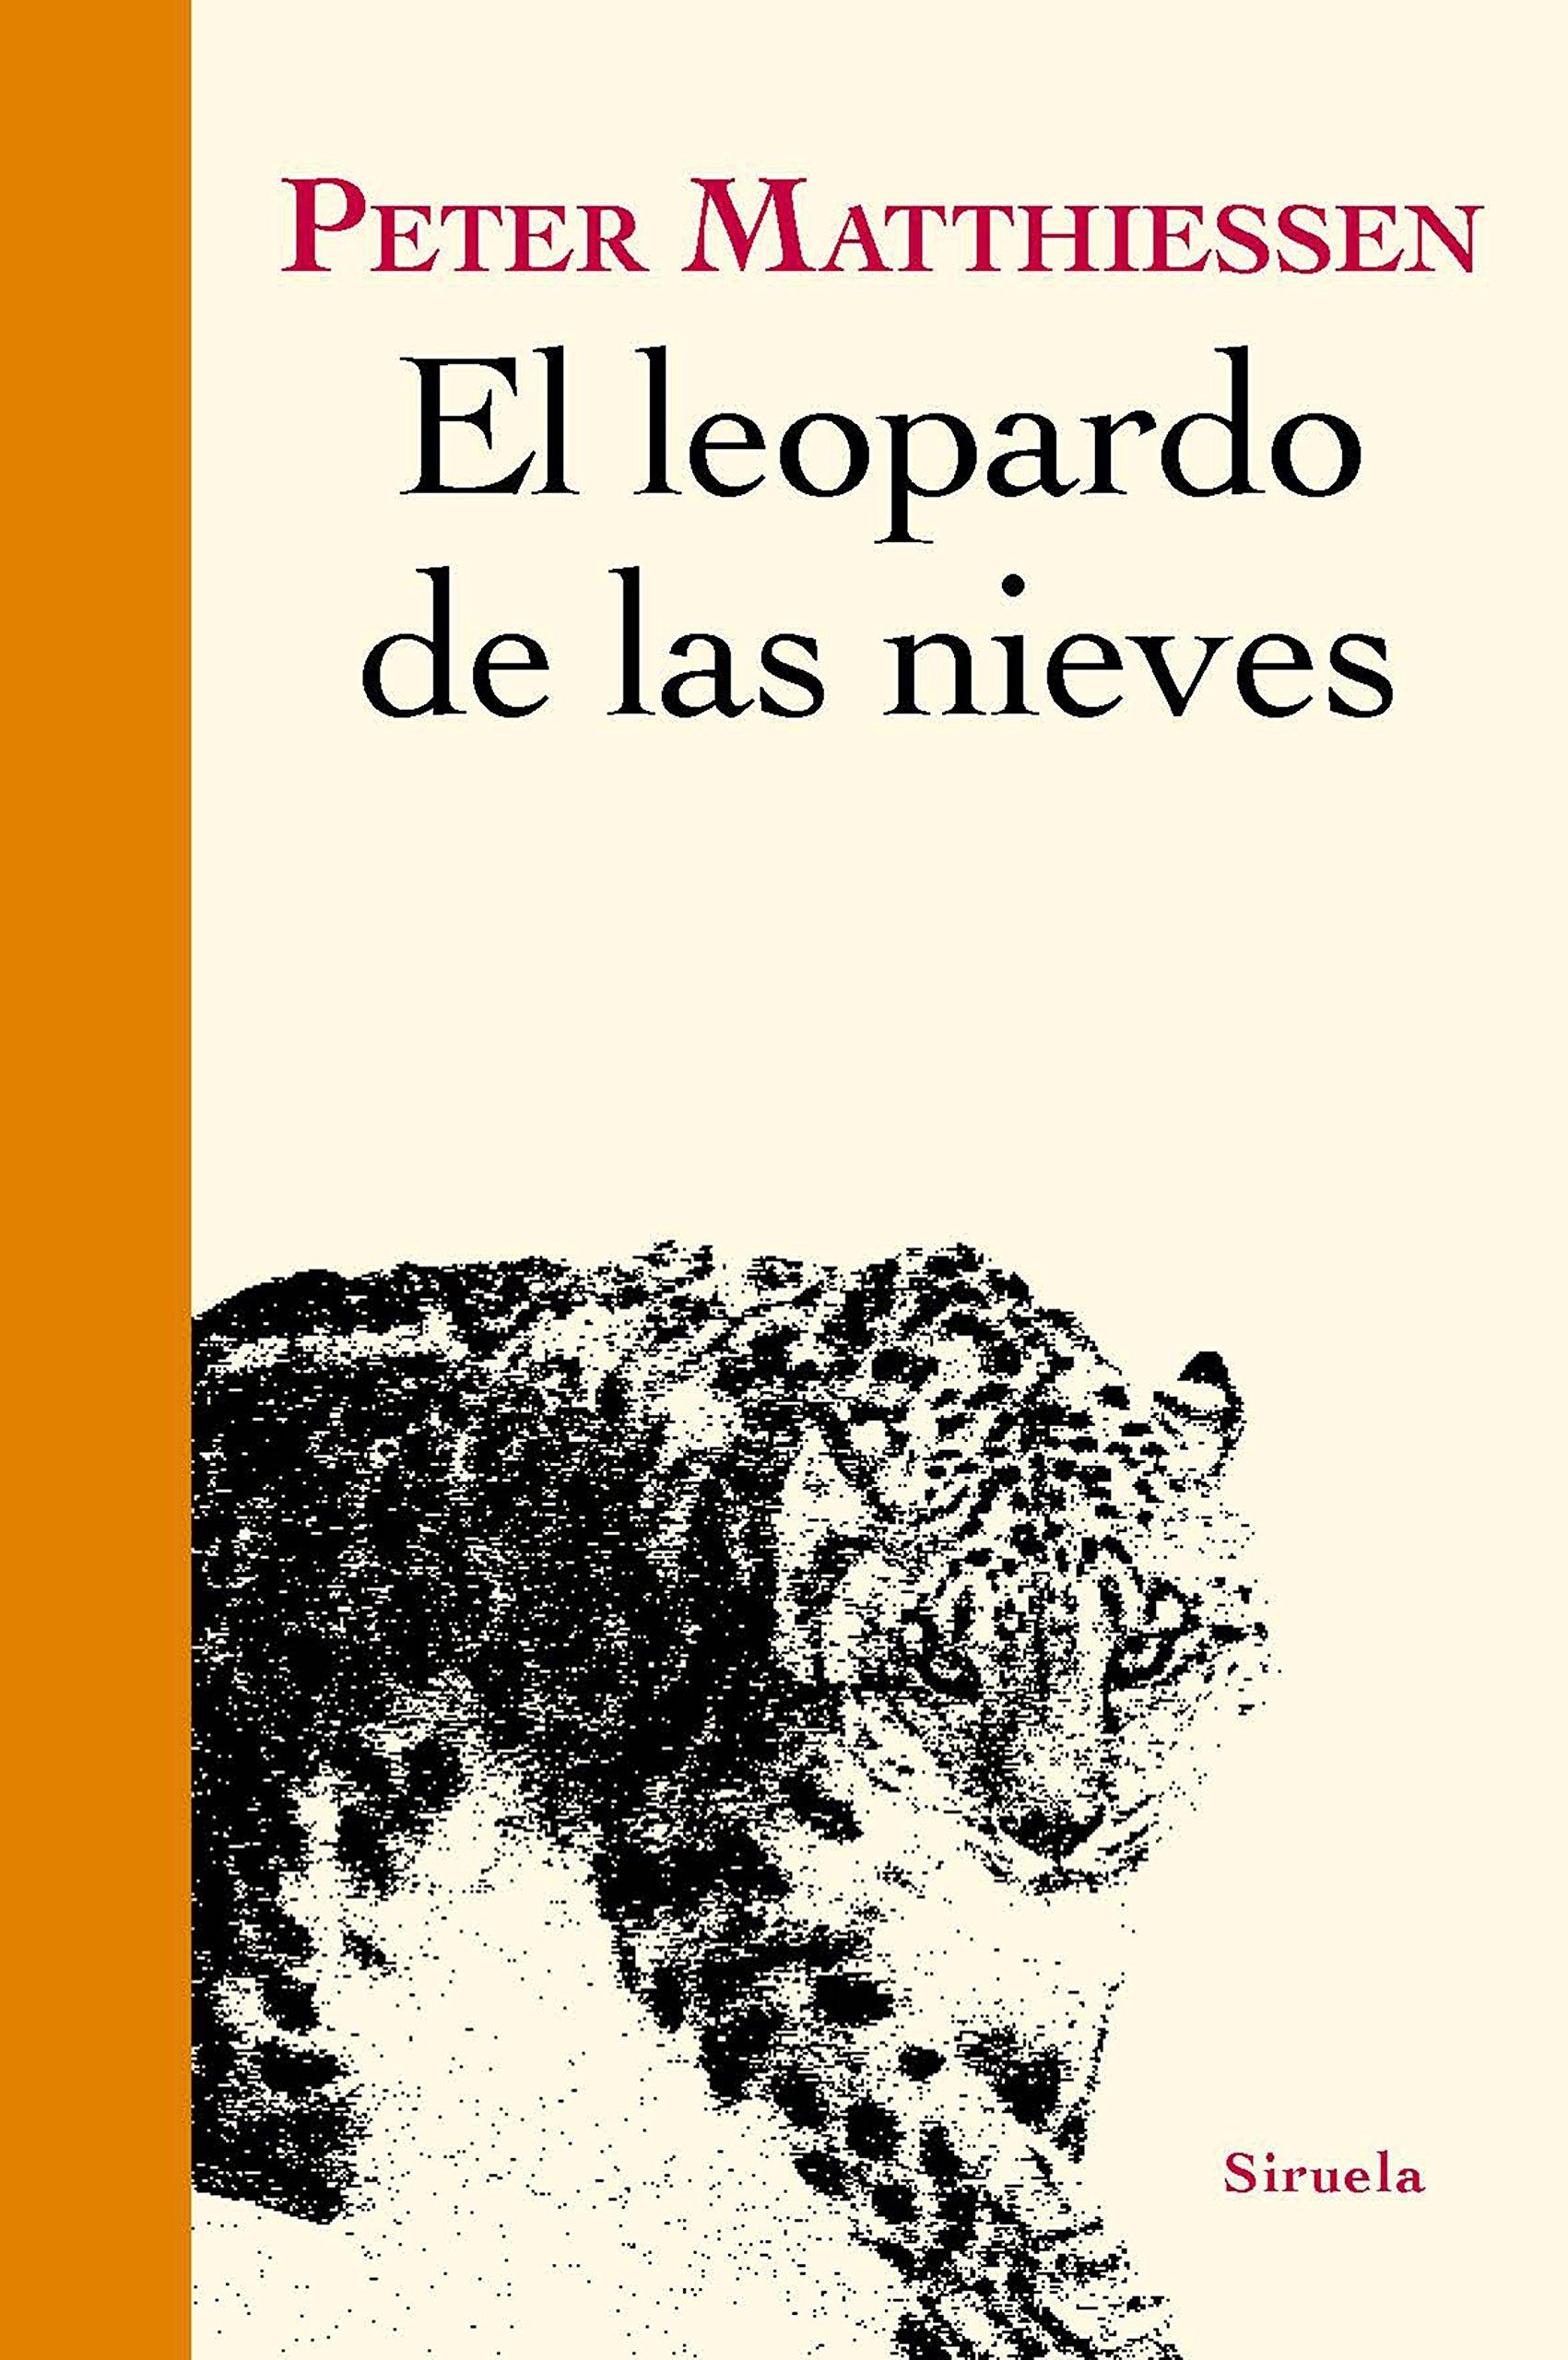 El leopardo de las nieves de Peter Matthiessen